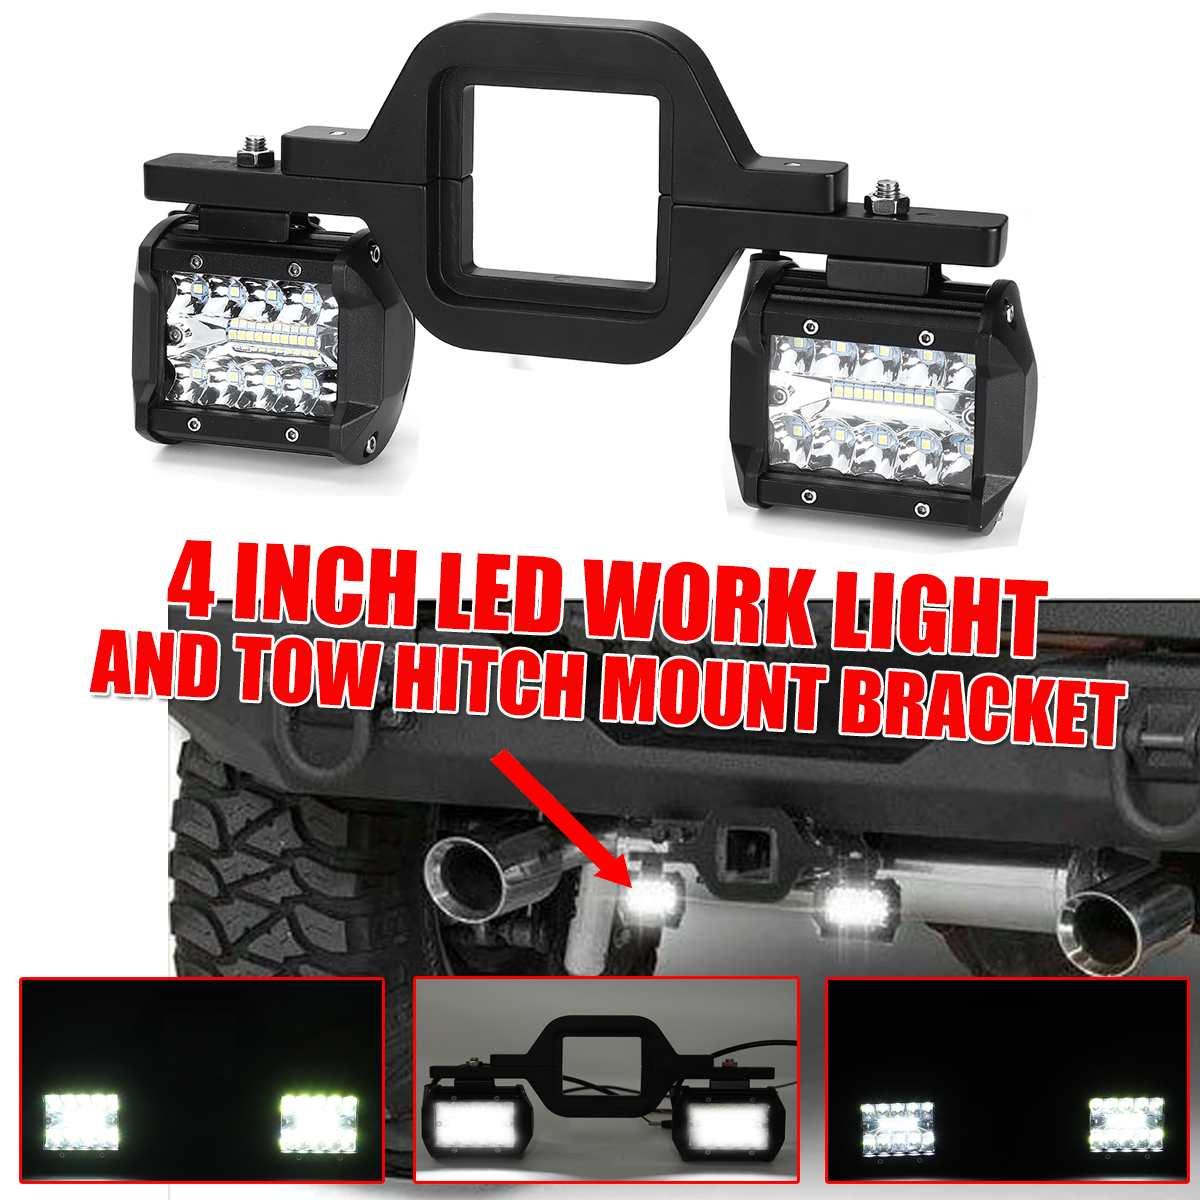 4 inch 8 LED Work Light Spot Flood Offroad Reverse Lights Bar with Trailer Tow Hitch Mount Bracket for Pickup Truck Van Camper